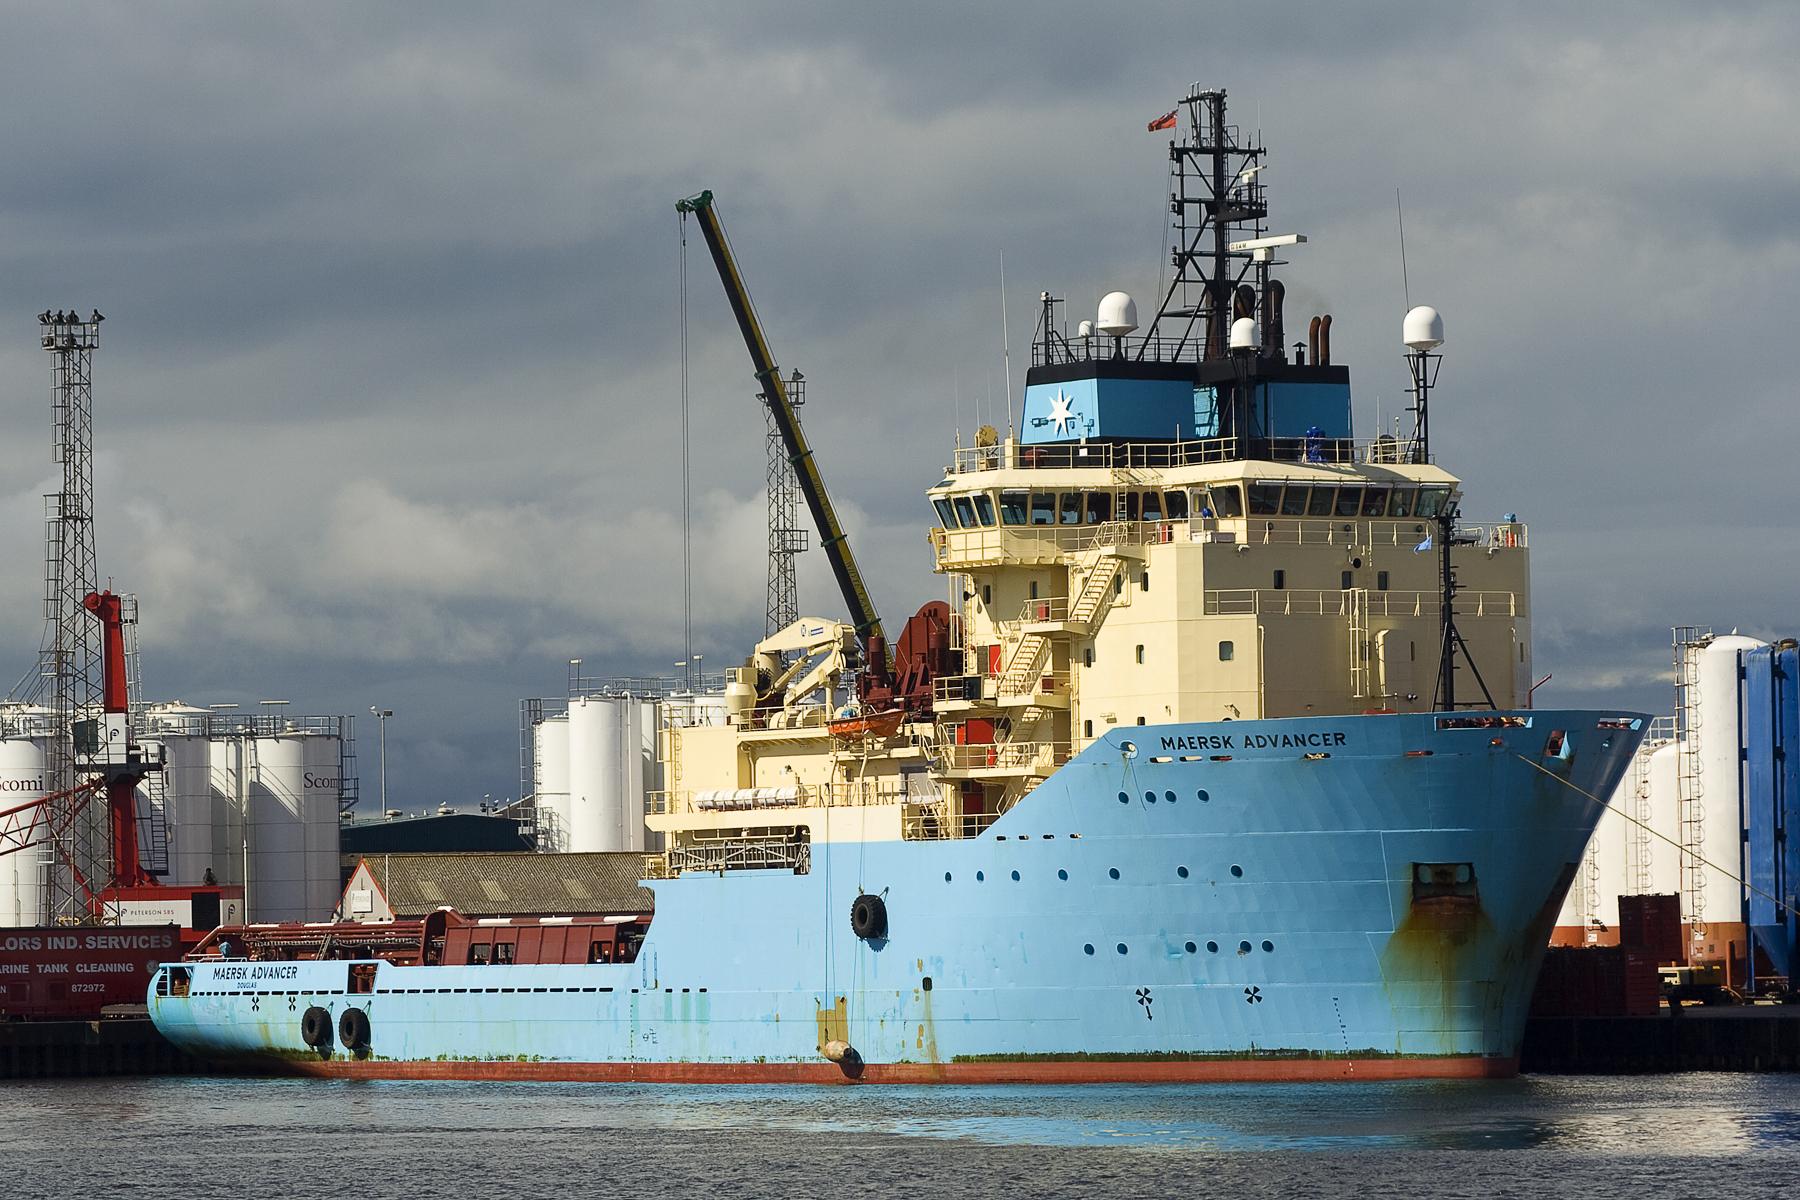 Maersk Advancer Via @Atisgailis